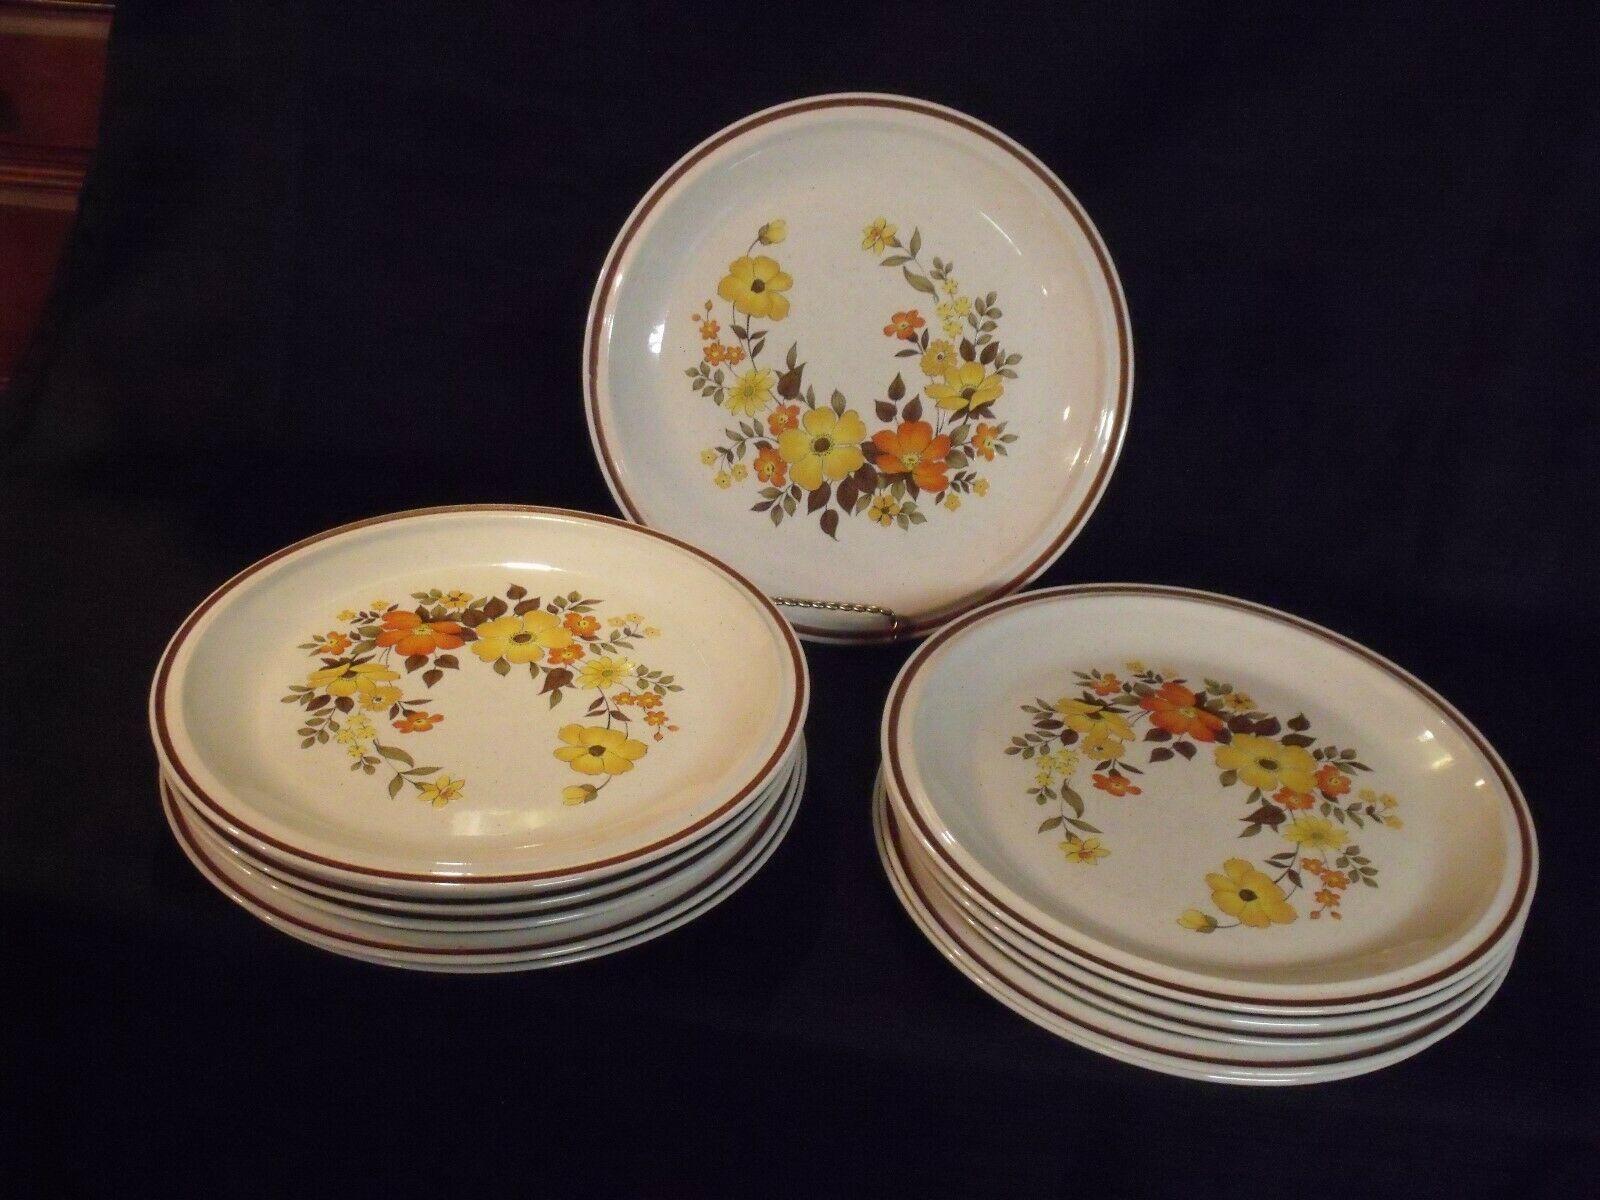 1970s Casual Elegance Hearthside Stoneware Chablis 572 Dinner Plates (11)  - $99.00